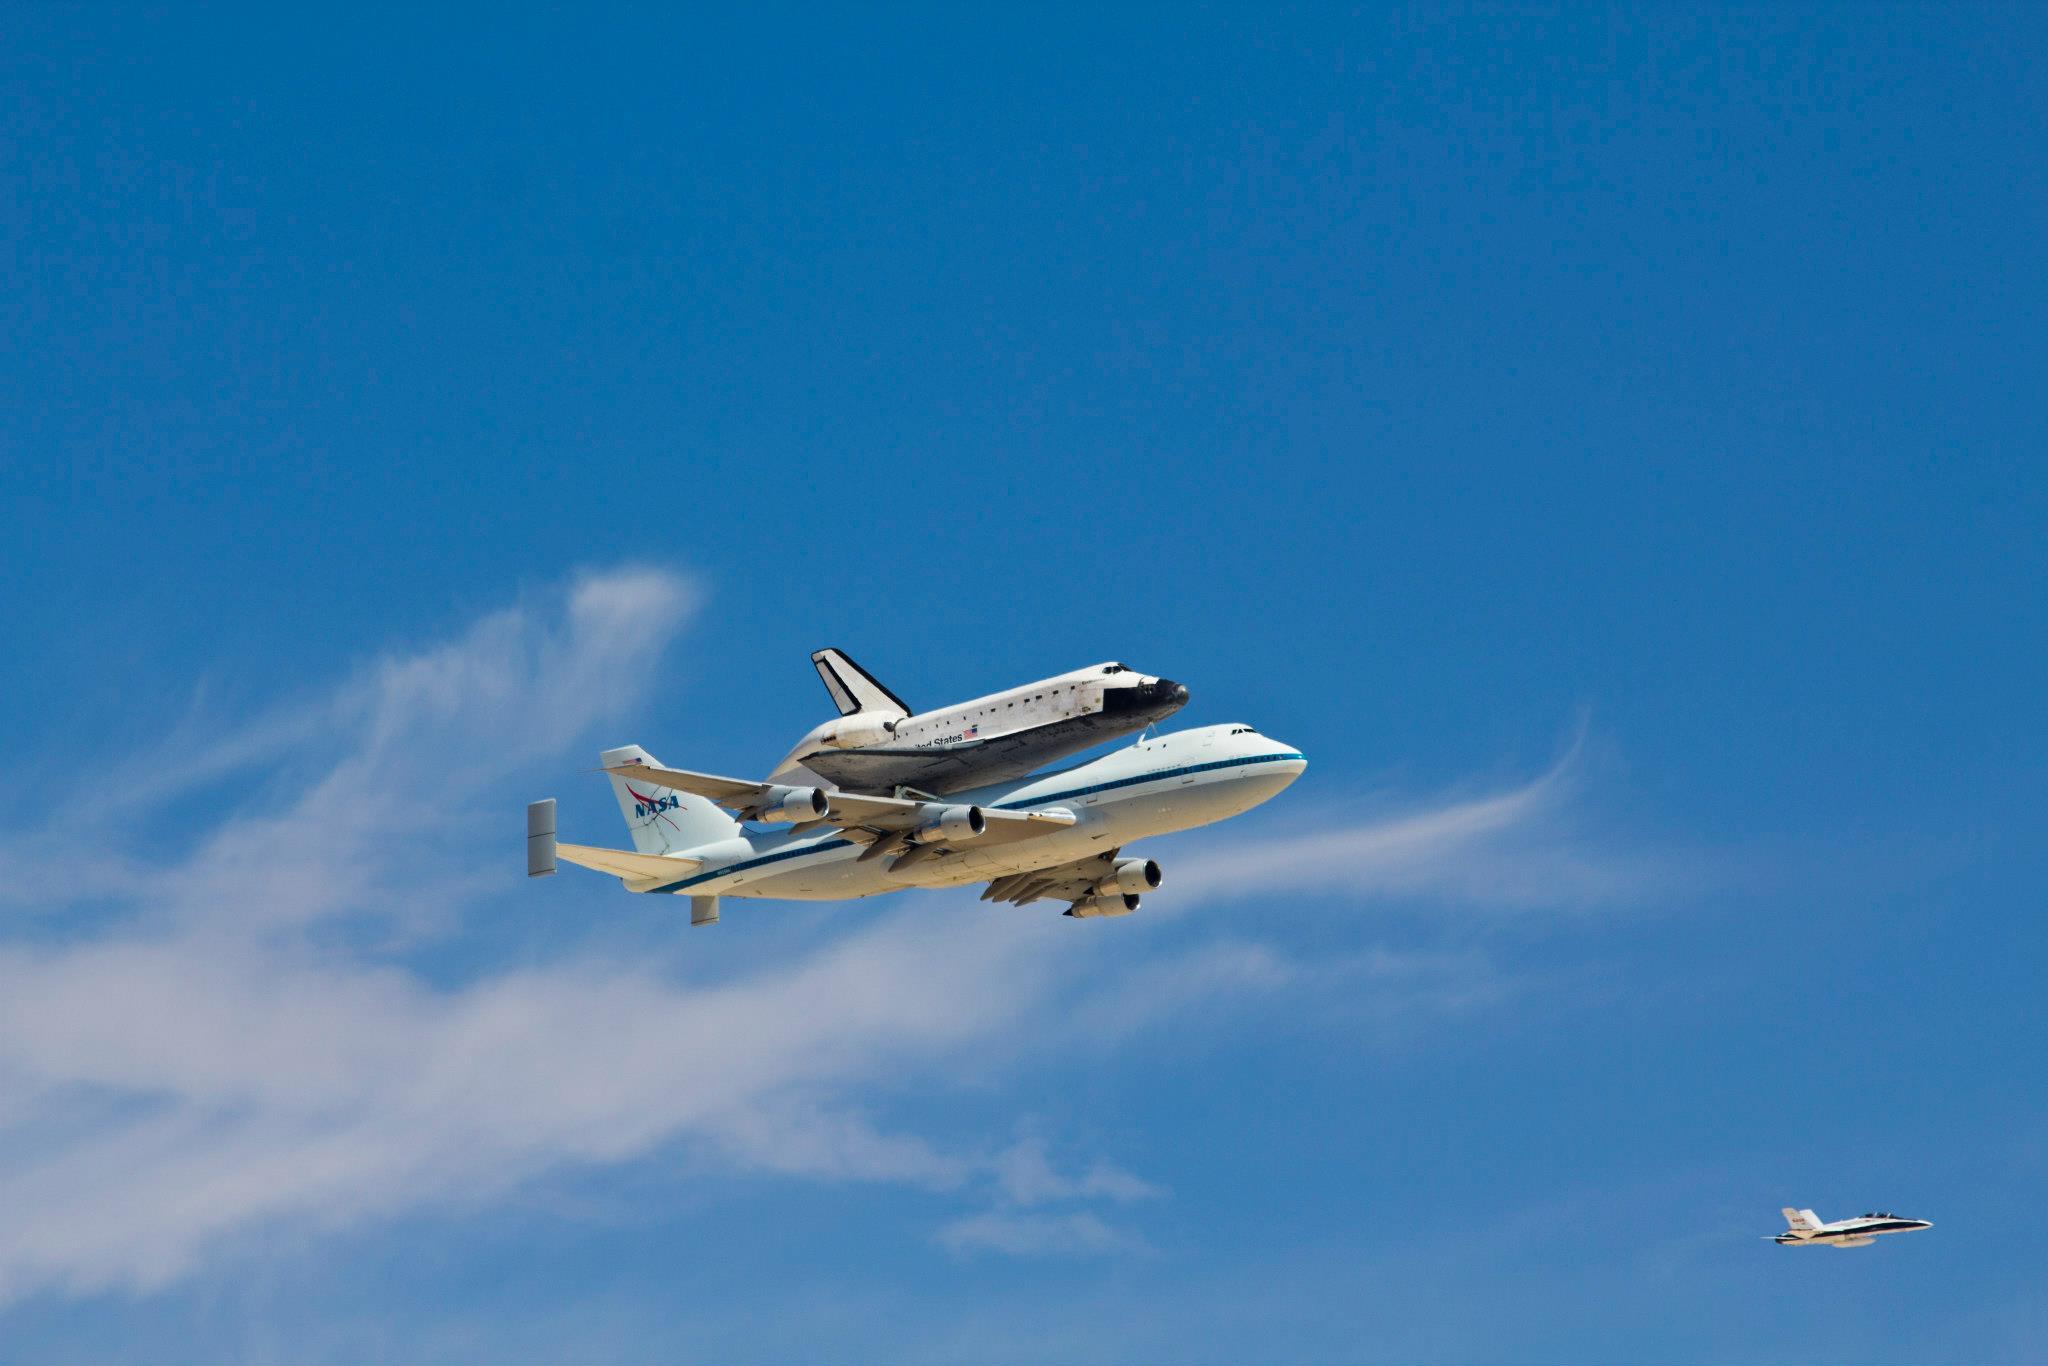 us space shuttle l - photo #38